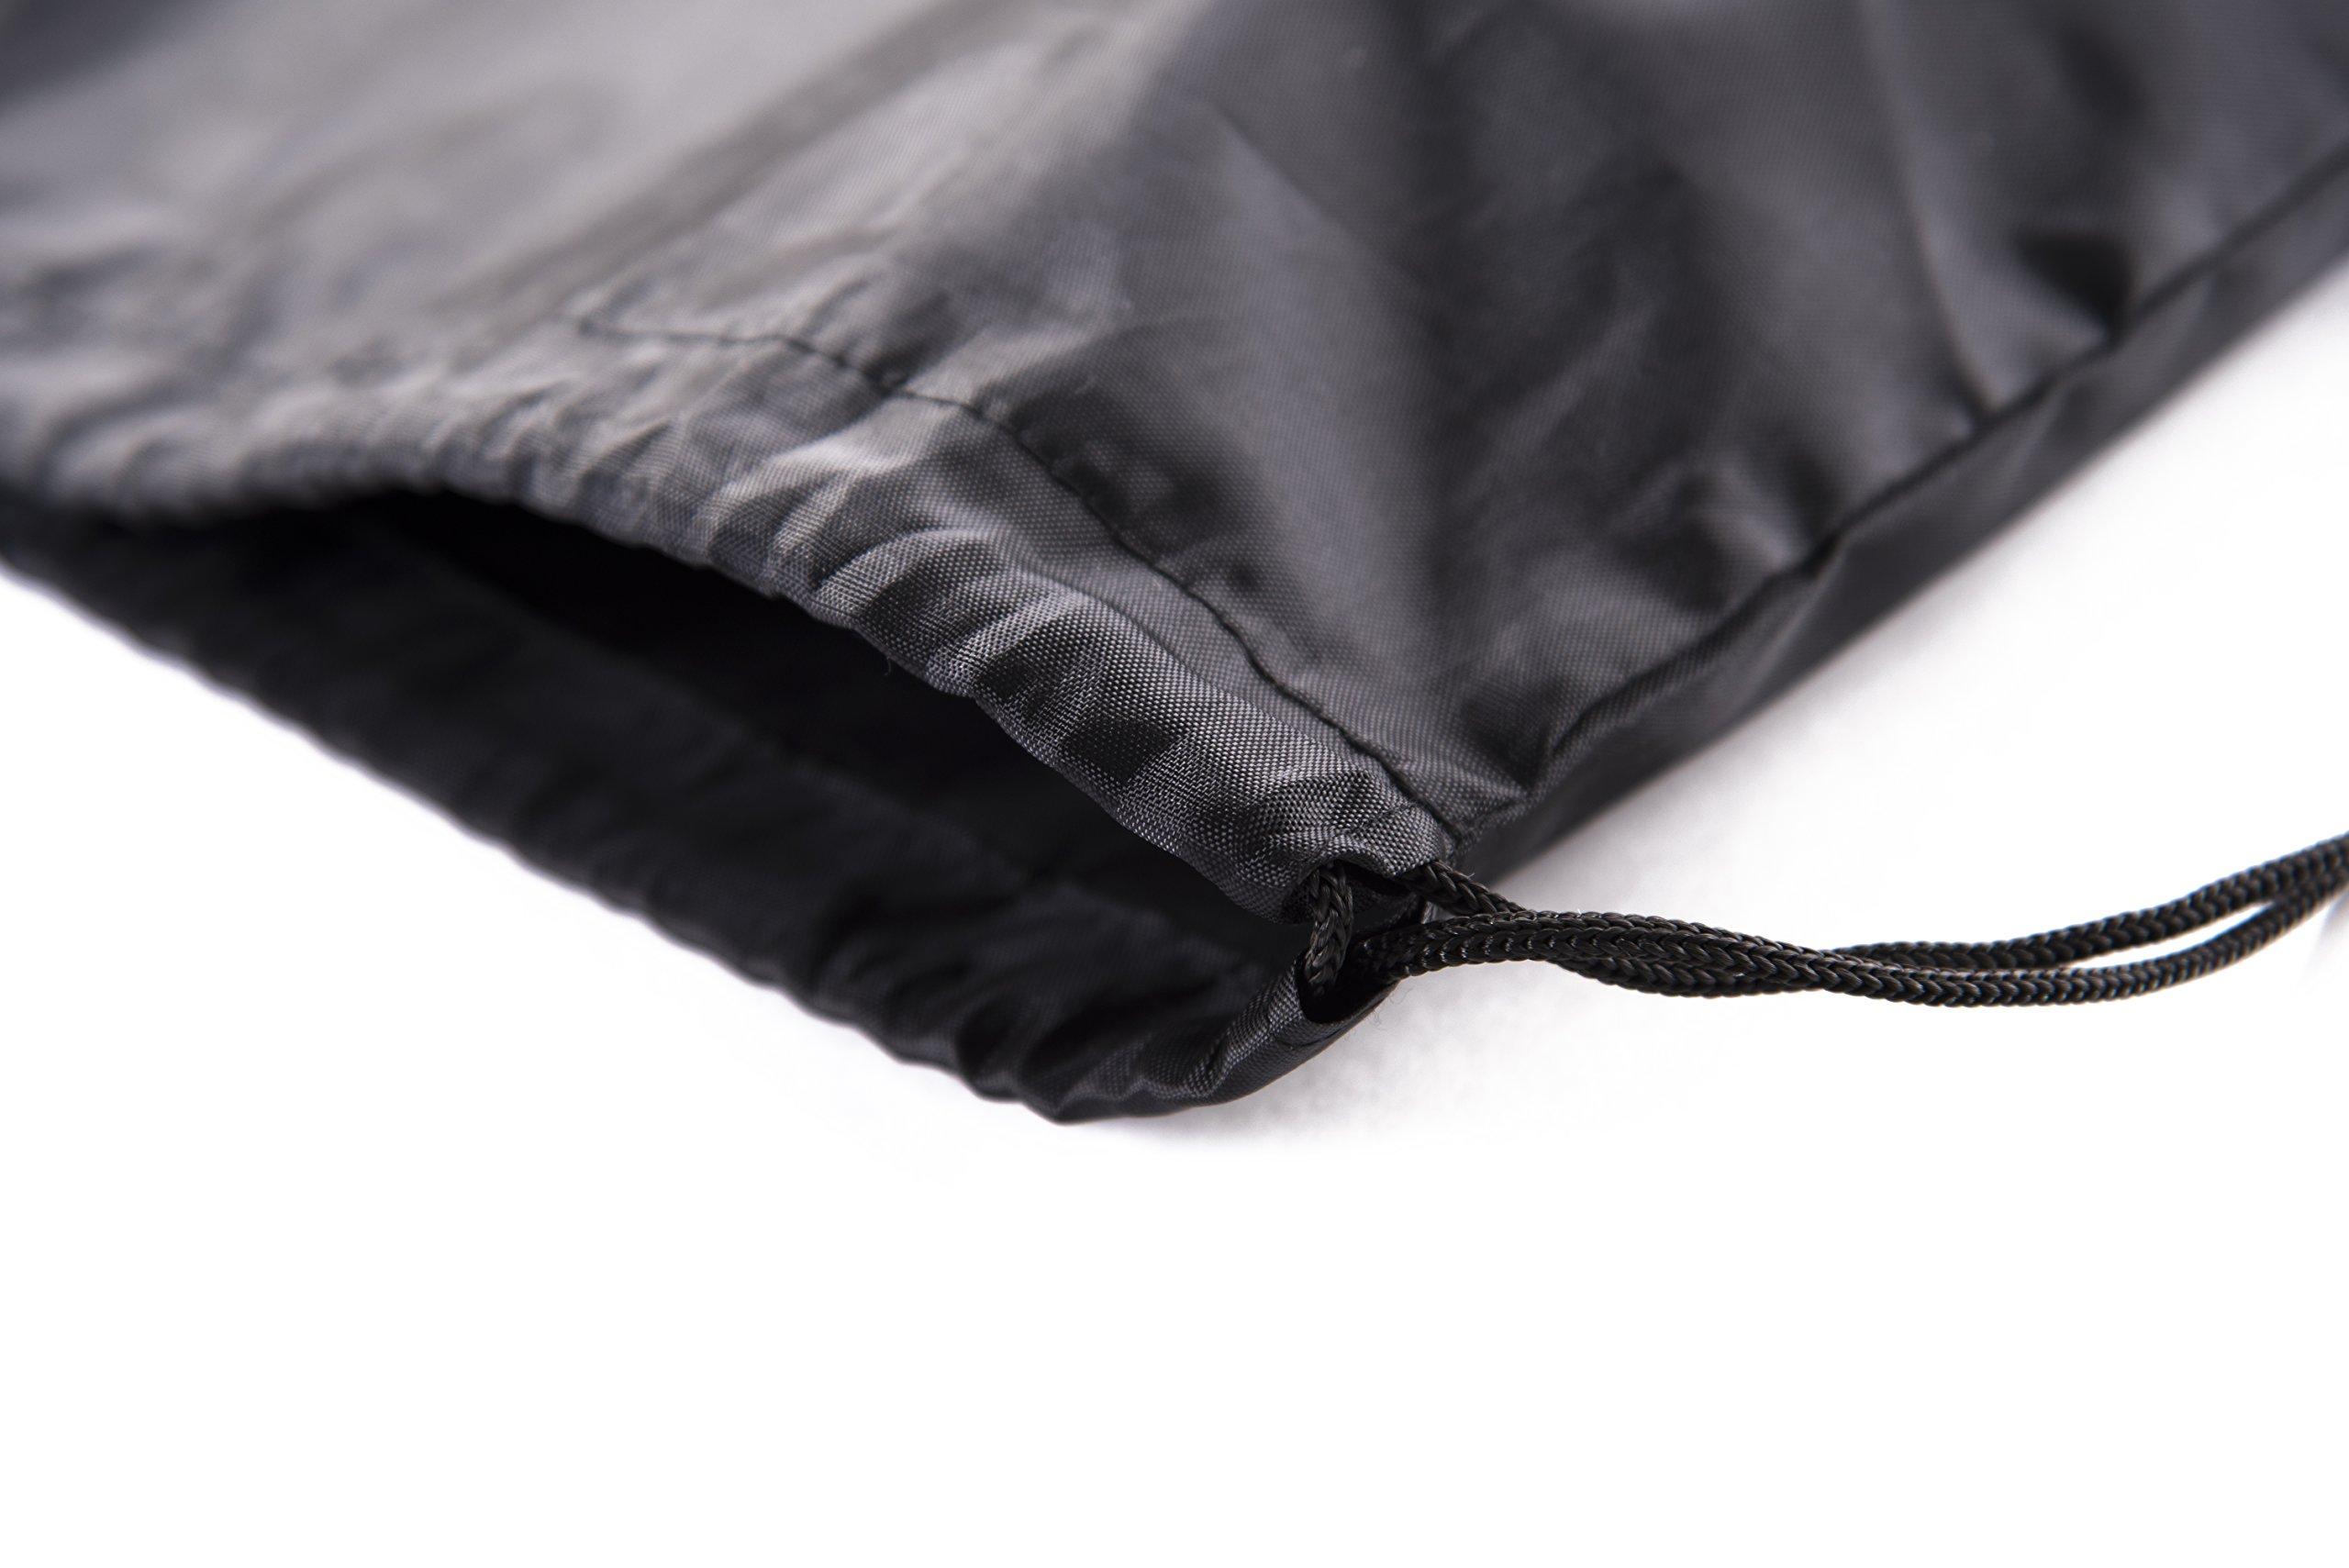 Mato & Hash Drawstring Bulk Bags Cinch Sacks Backpack Pull String Bags   15 Colors   1PK-100PK Available by Mato & Hash (Image #5)